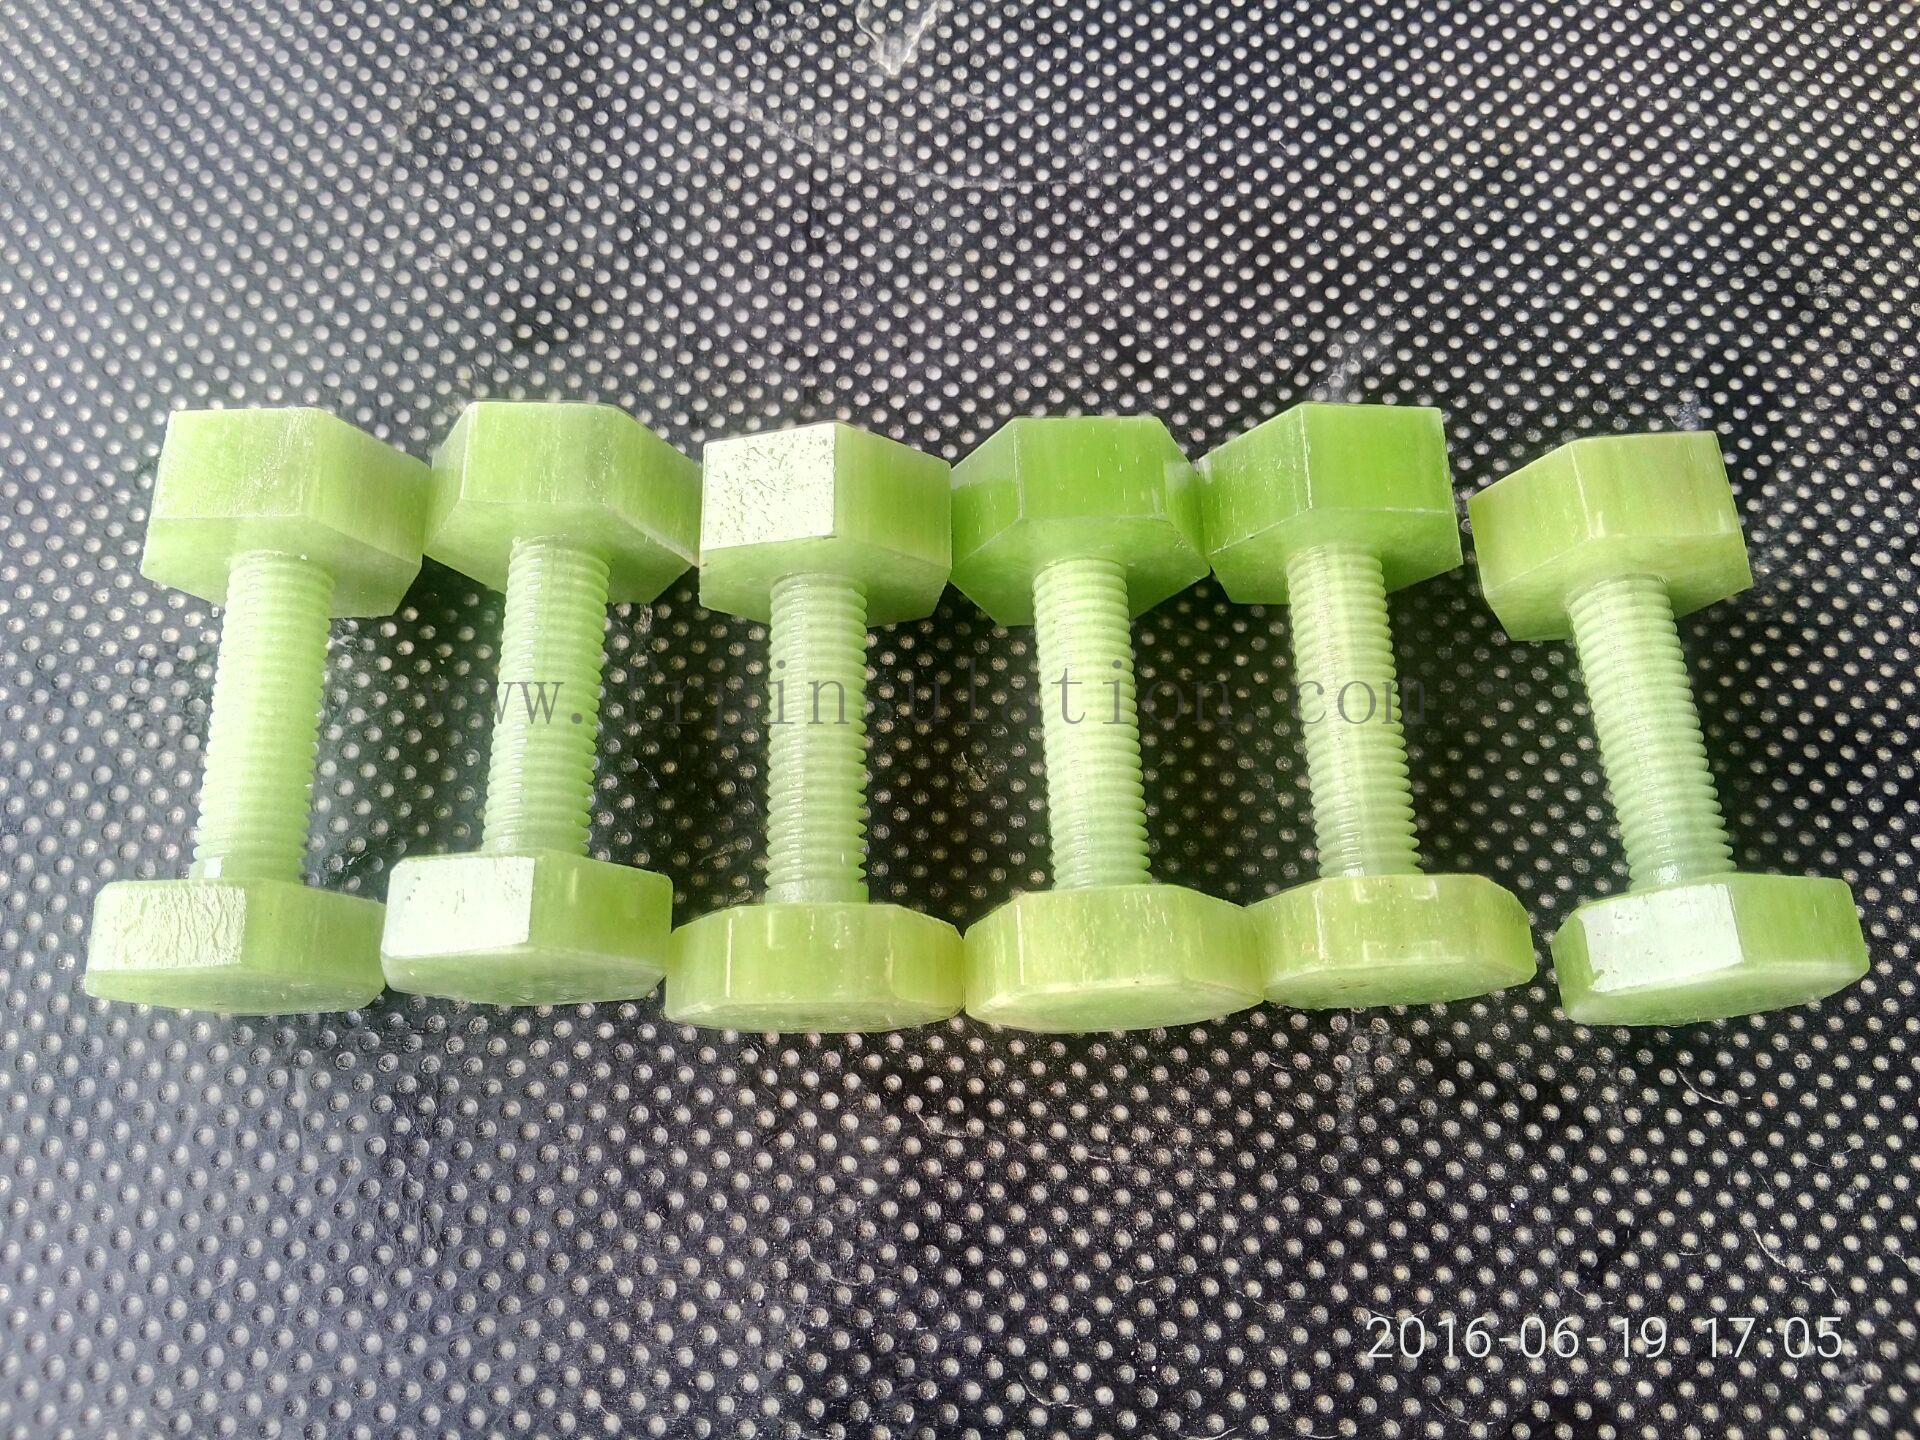 Insulation bolts